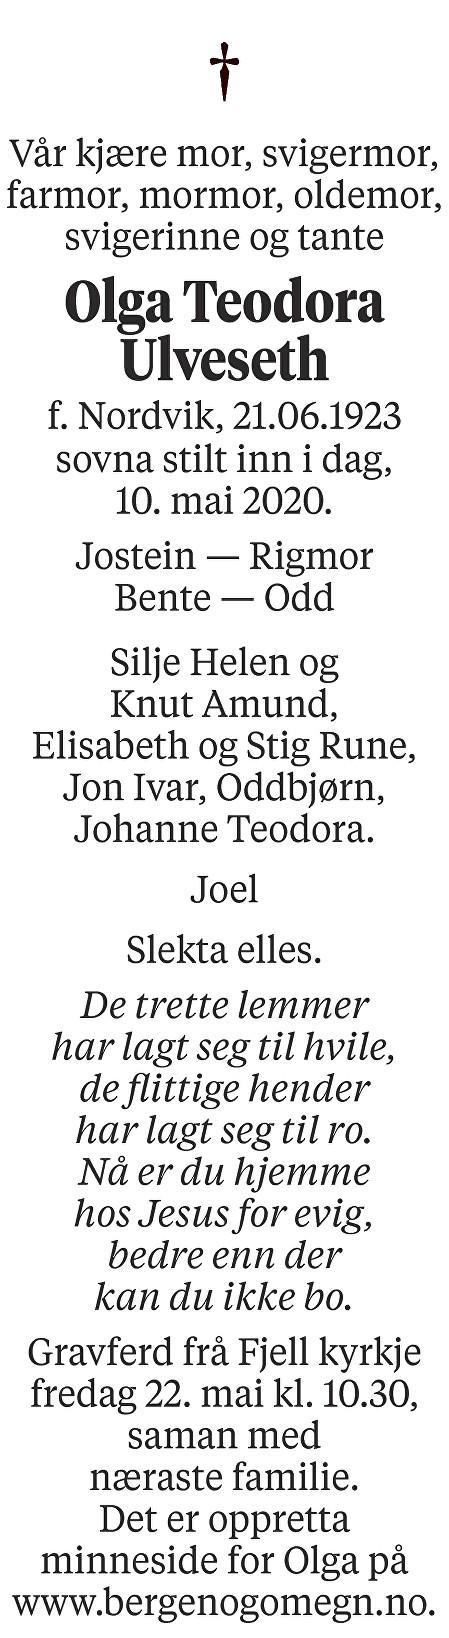 Olga Teodora Ulveseth Dødsannonse